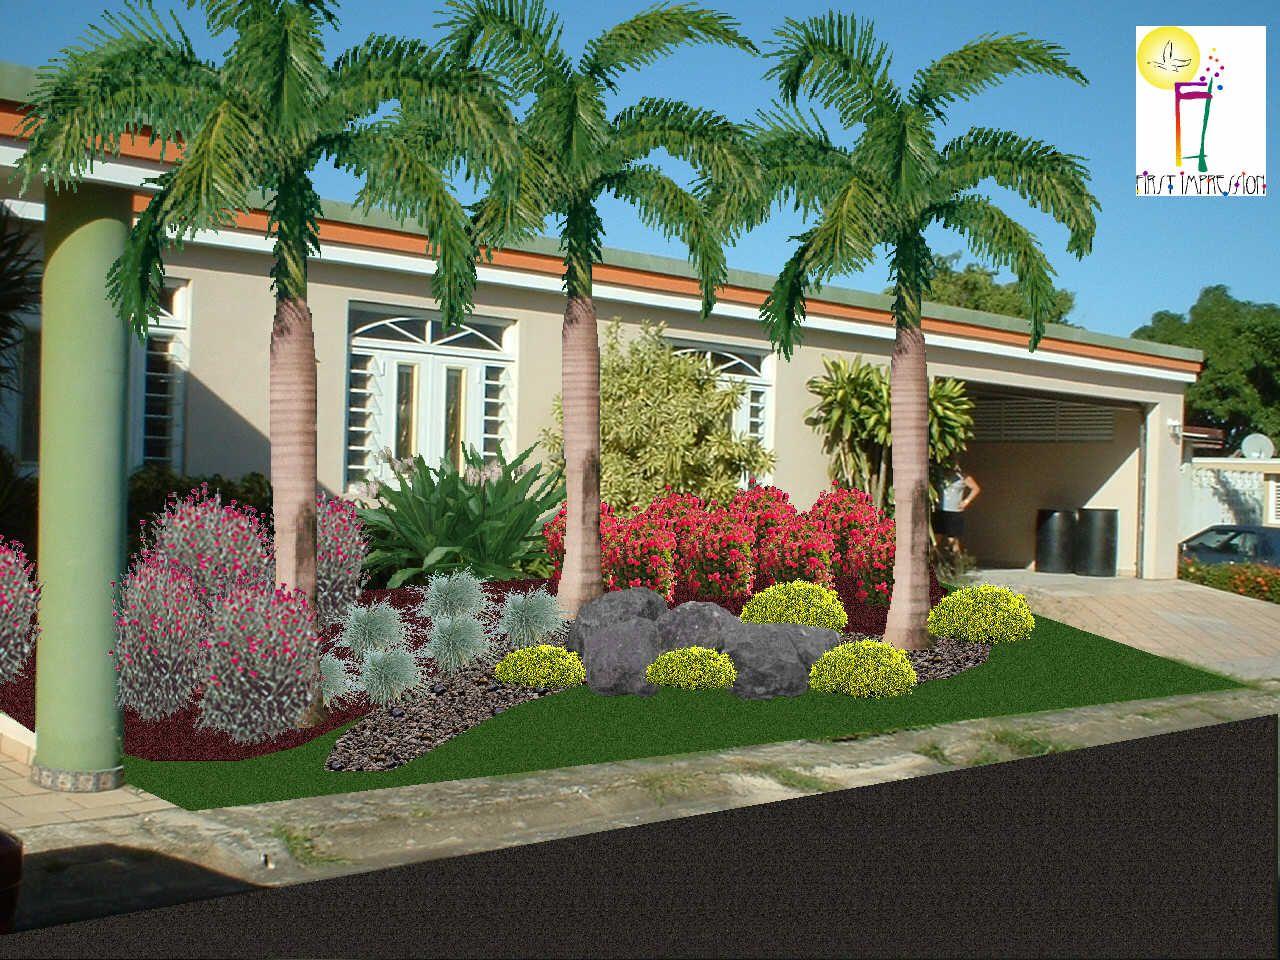 landscaper puerto rico google search tropical landscaping pinterest. Black Bedroom Furniture Sets. Home Design Ideas